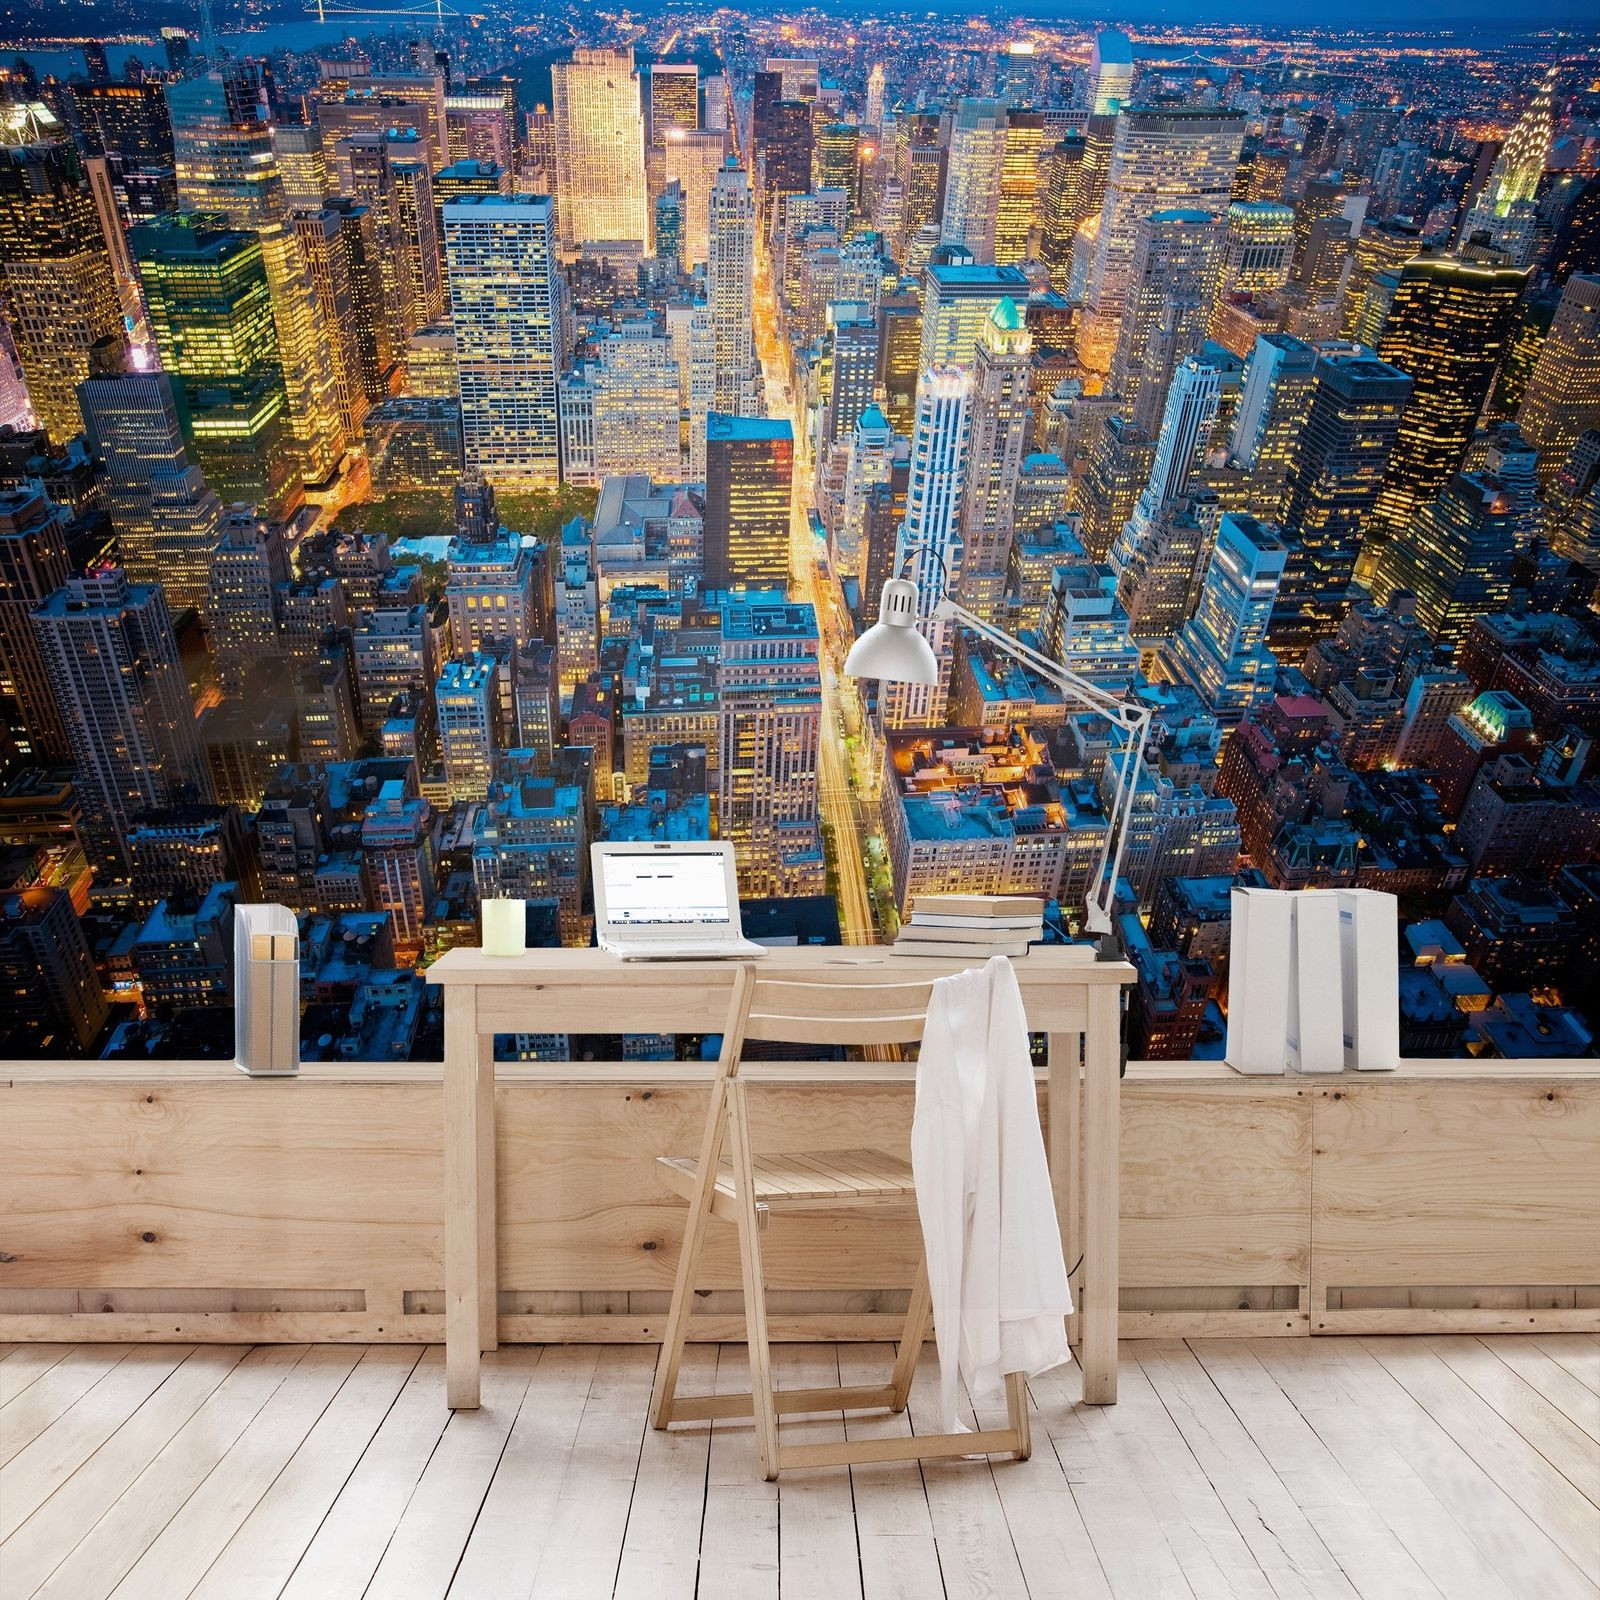 Vliestapete Midtown Manhattan Fototapete Breit Tapete Wandtapete Dekotapete Wand